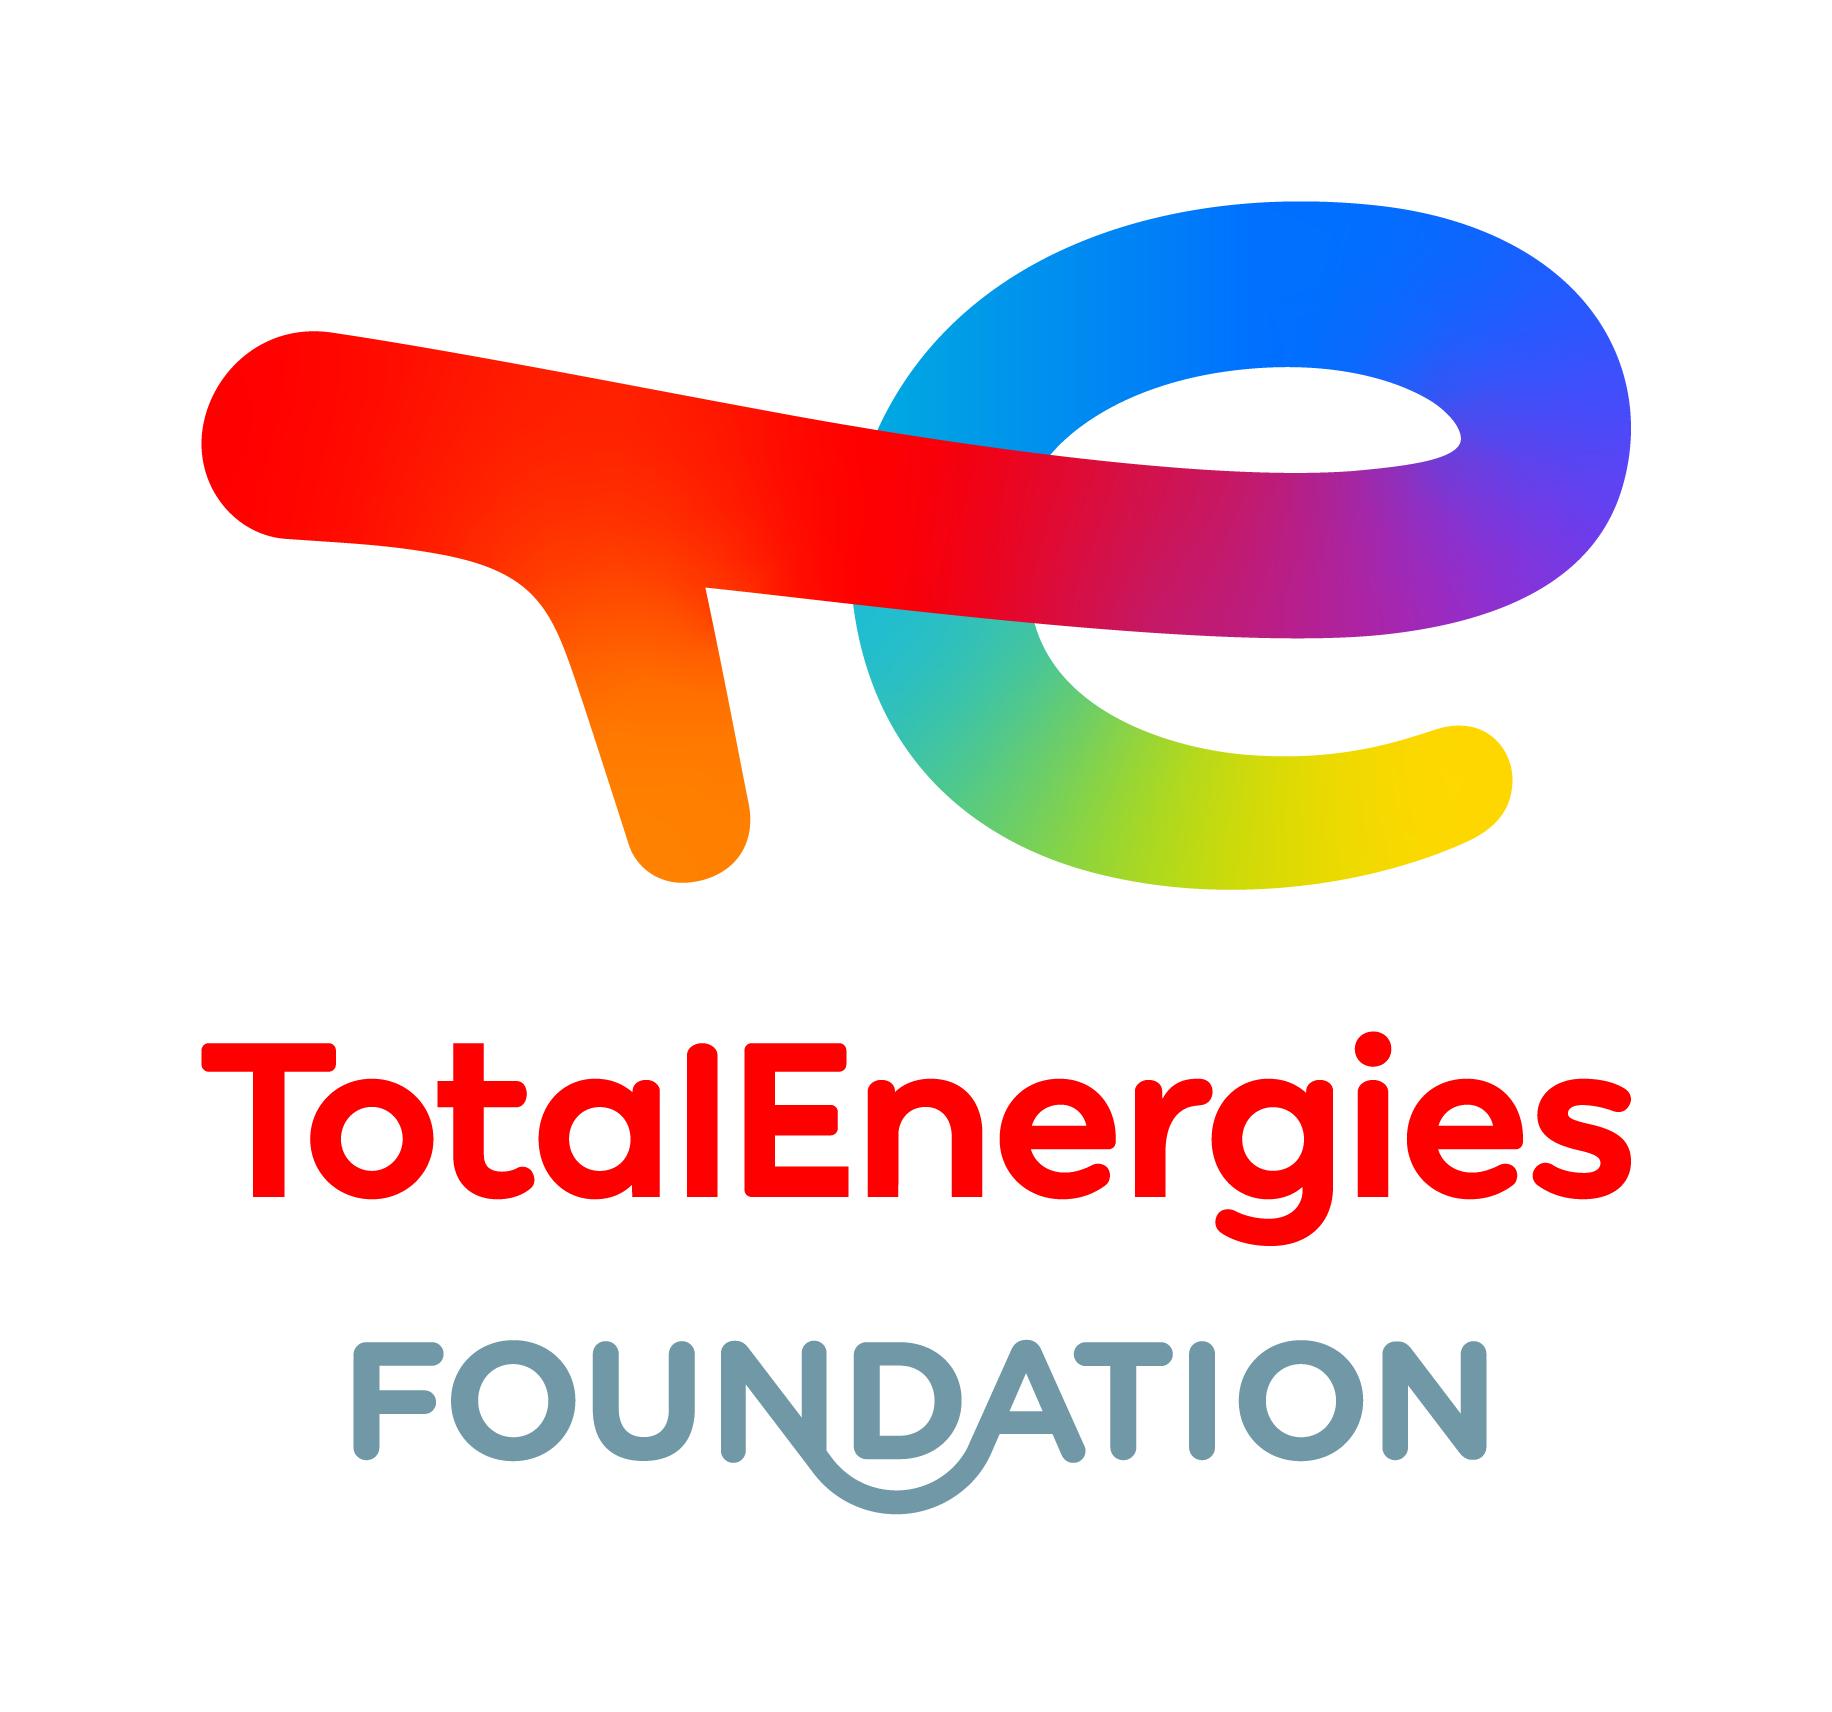 TotalEnergies Foundation